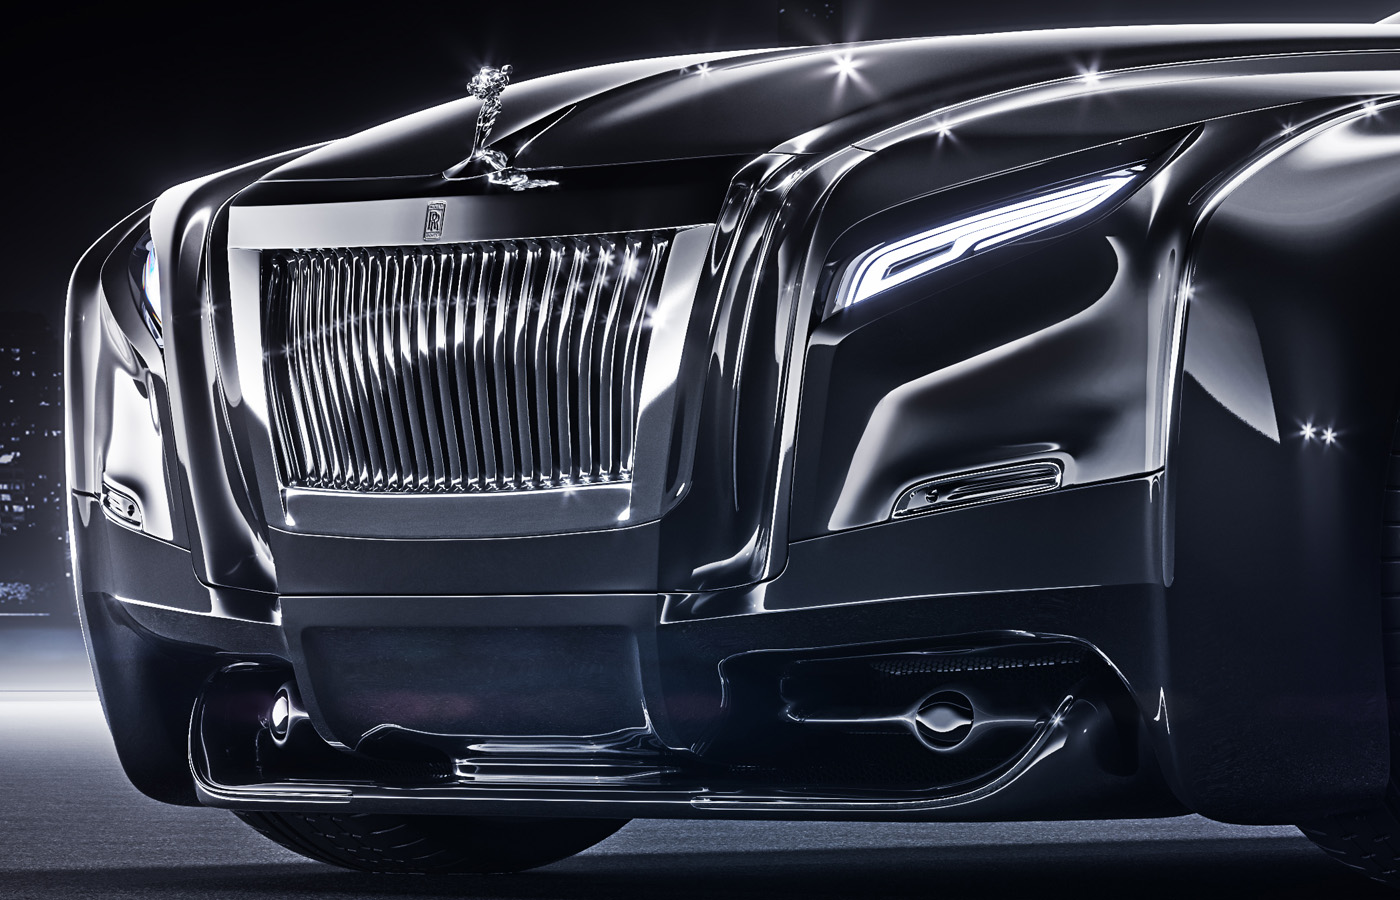 Rolls Royce luxury automotive design 2 1.jpg